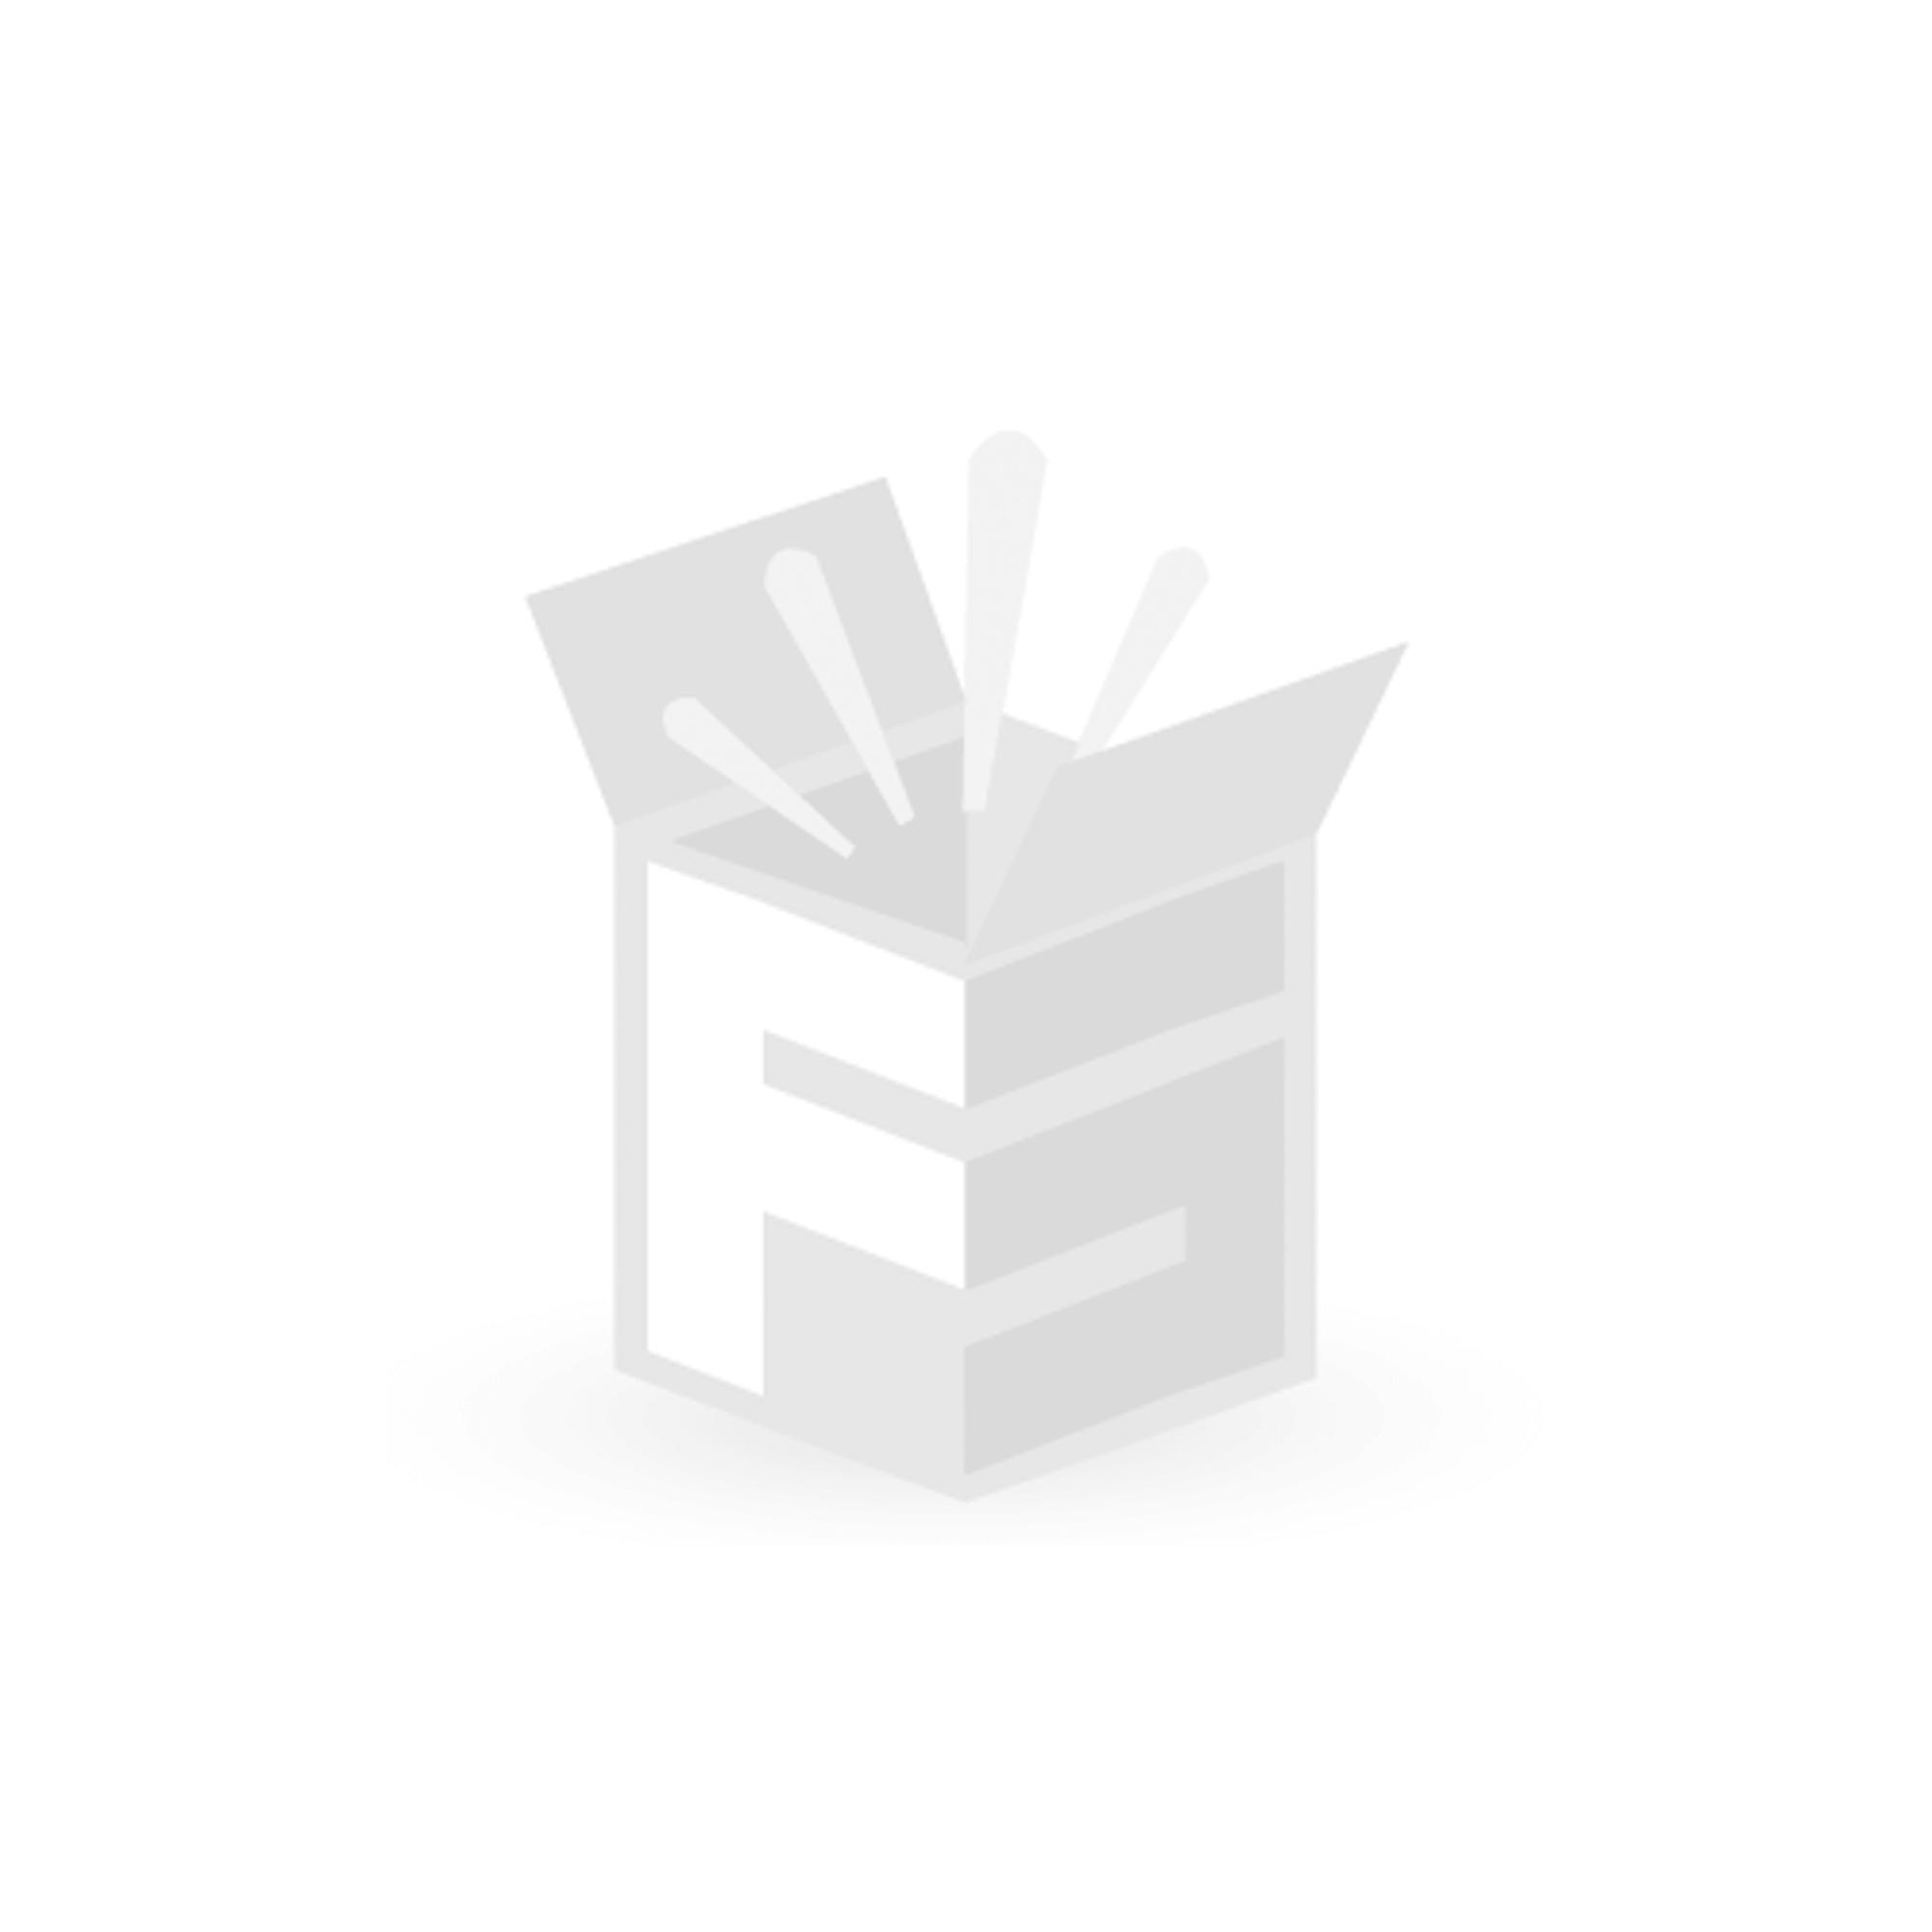 Contini höhenverstellbarer Bürotisch 160 x 80 cm, grau / Gestell dunkelgrau